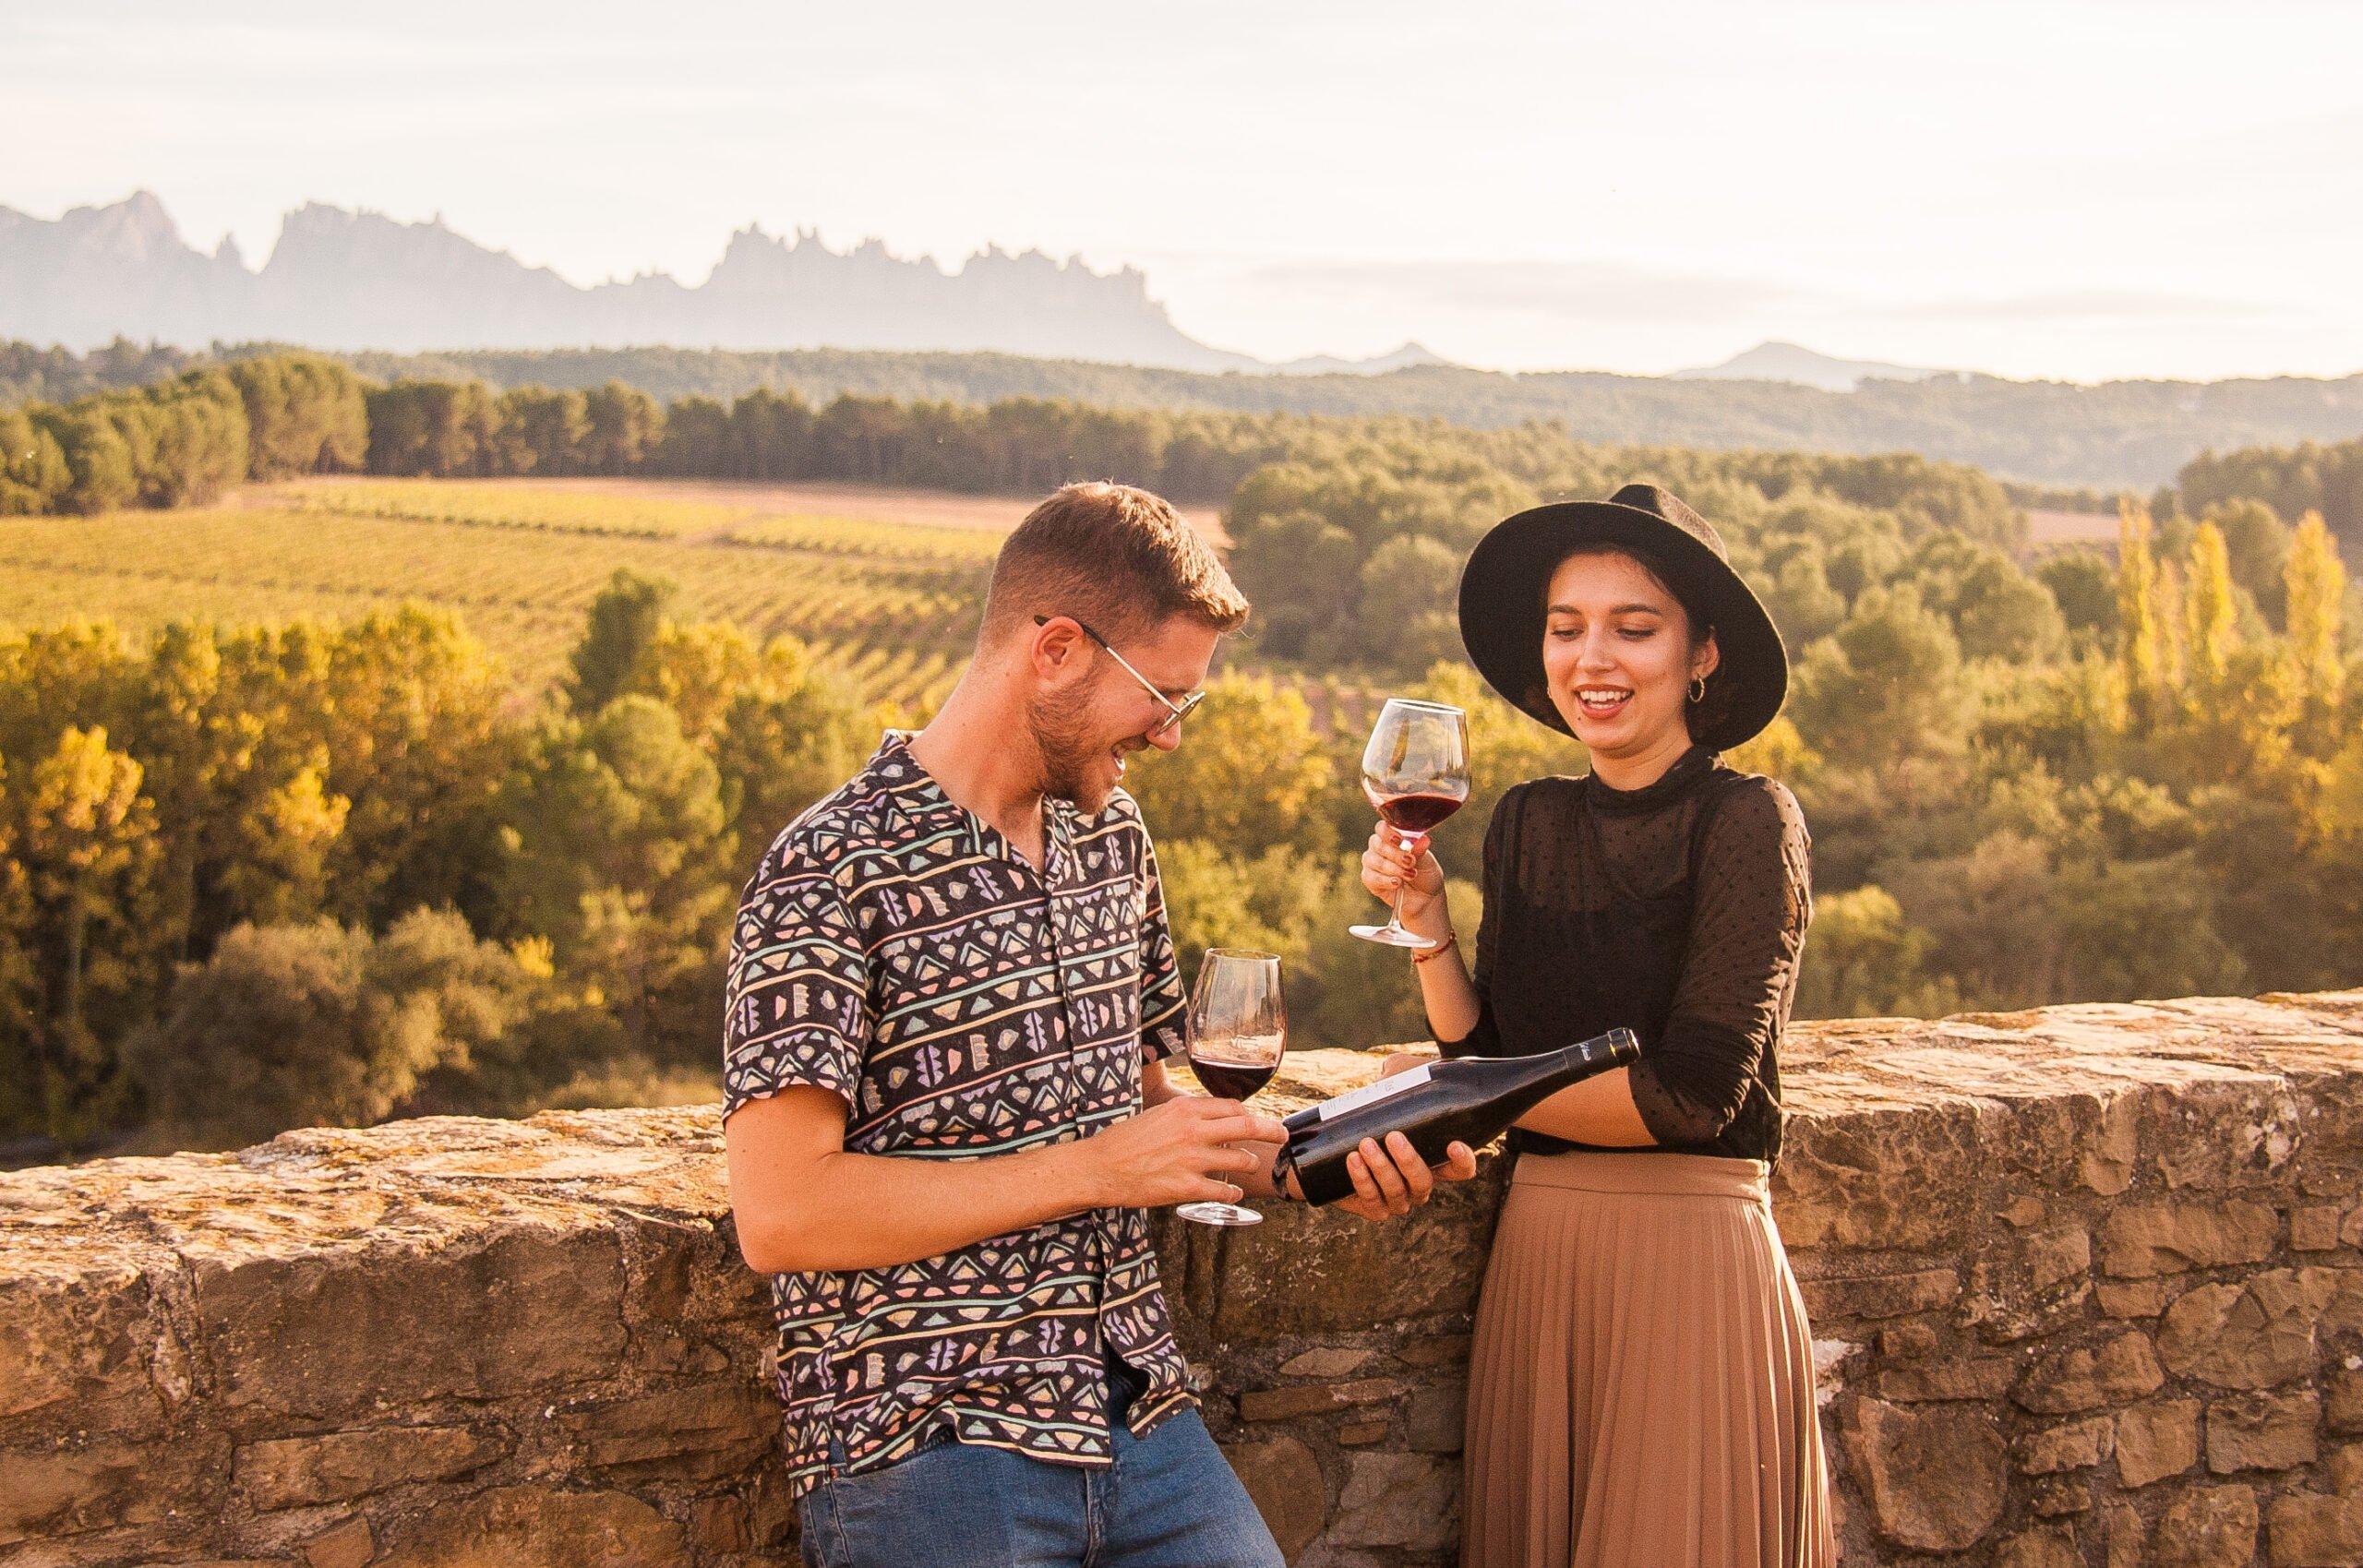 Montserrat, Tapas & Wine Tour With Cogwheel Train Ride From Barcelona_113_4